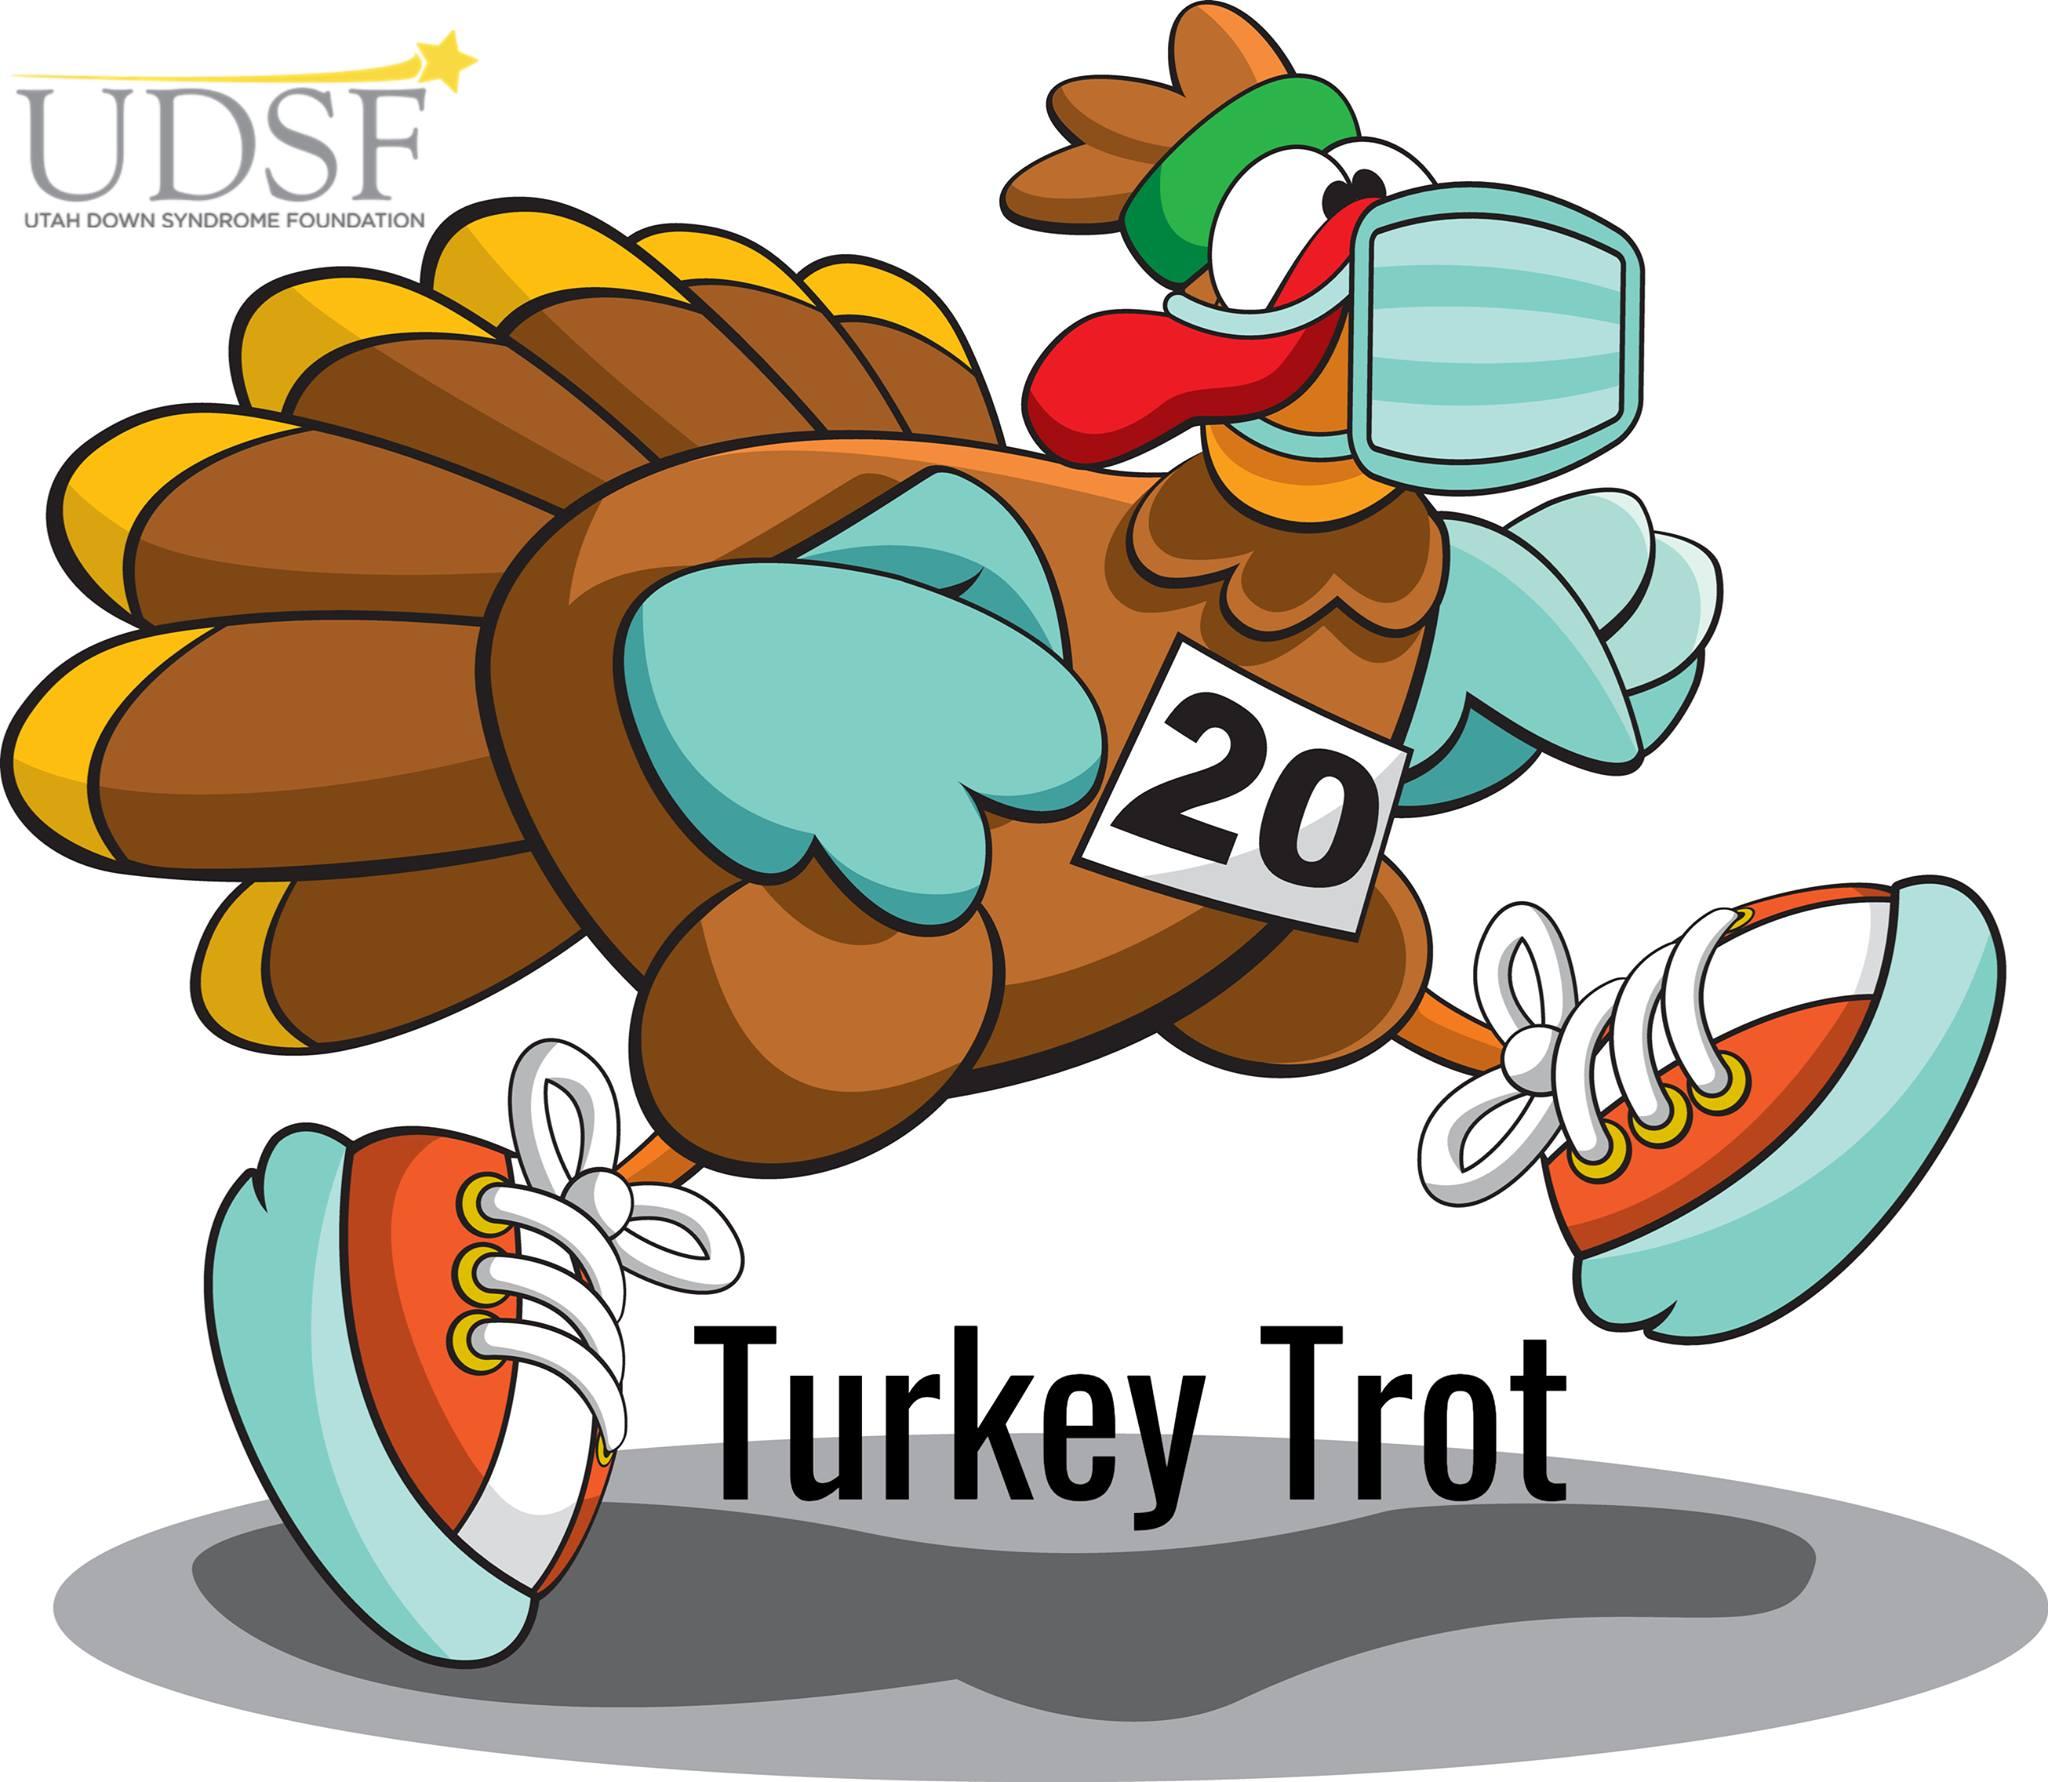 Udsf turkey trot